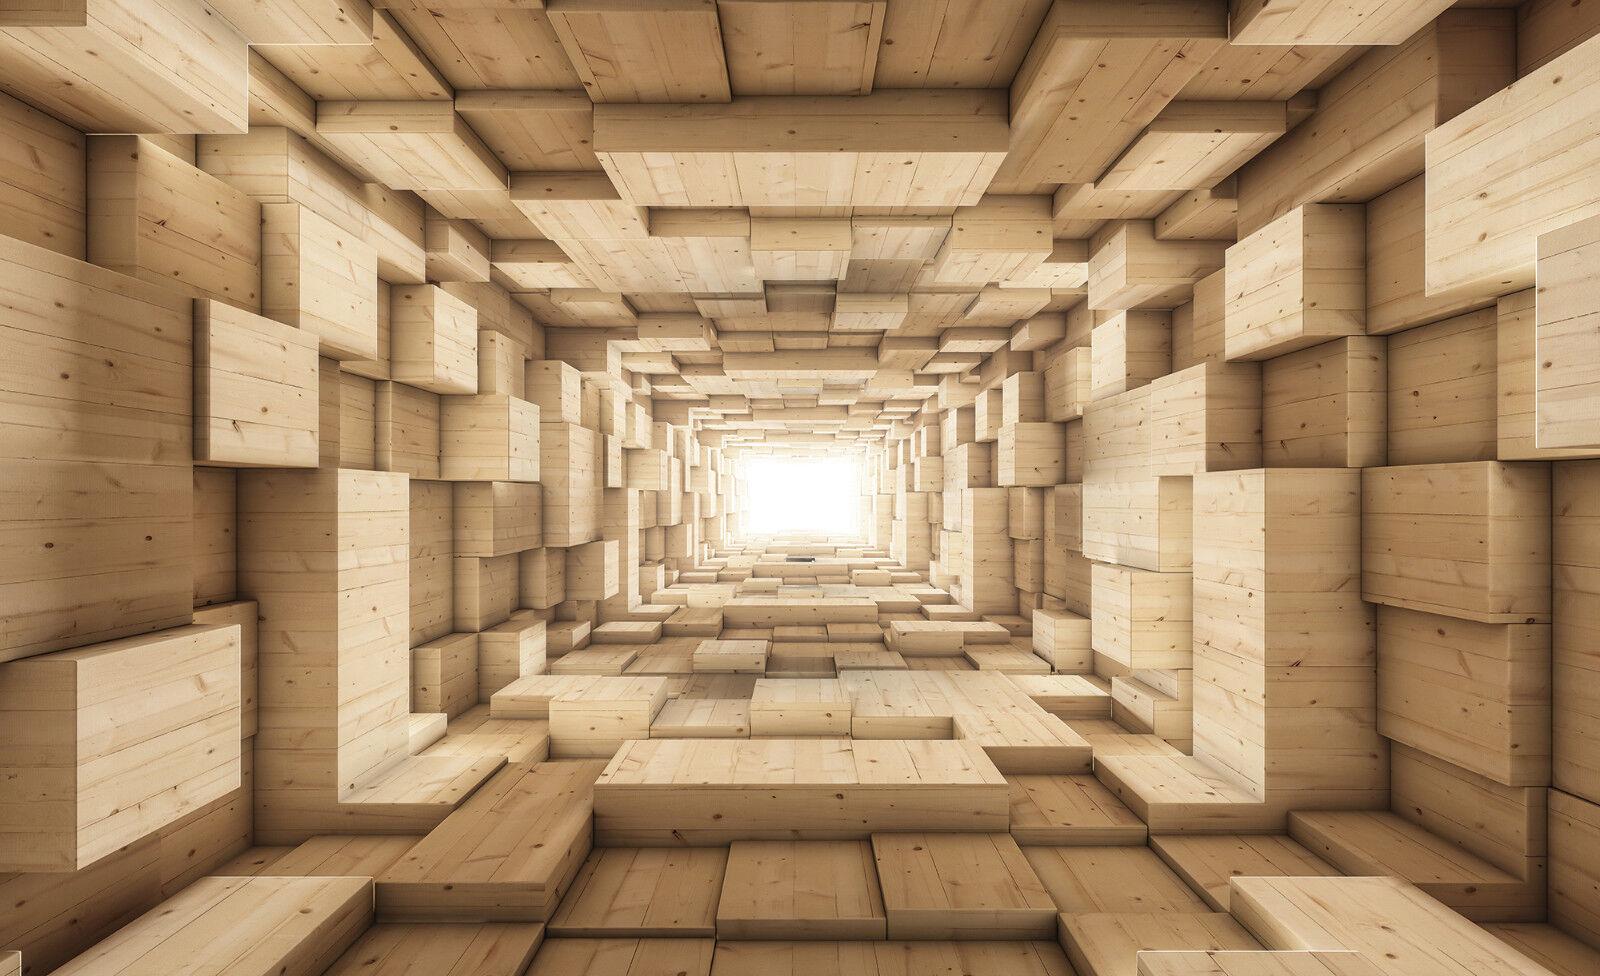 VLIES Fototapete-3D HOLZ-WAND-(3247)-Tunnel Fantasie Abstraktion Mural xxl